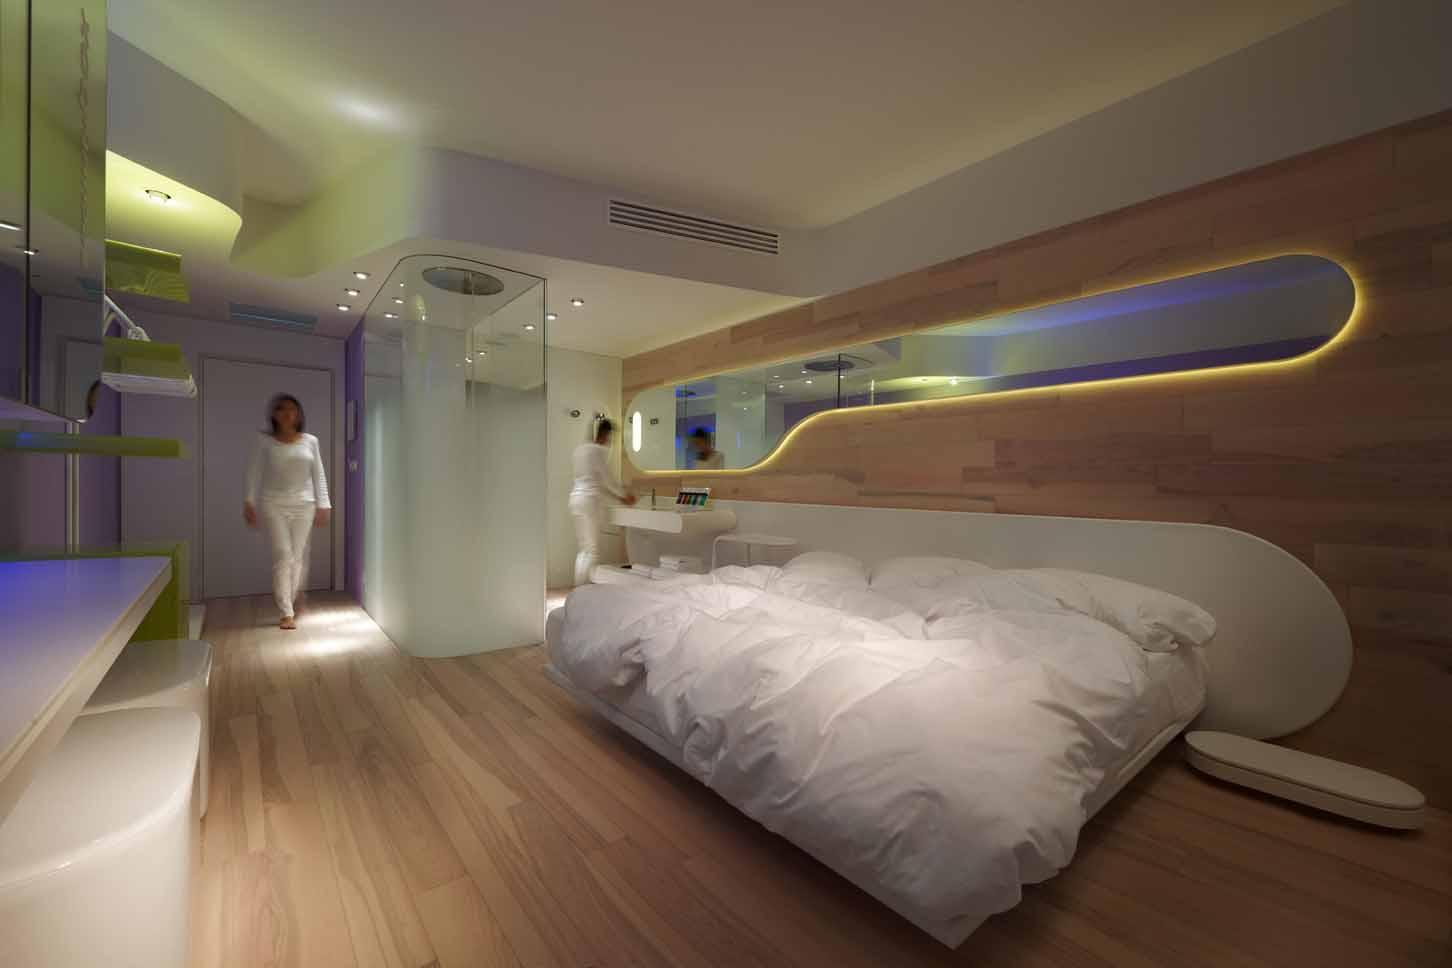 Bagno simone micheli blog for Design merrion hotel 4